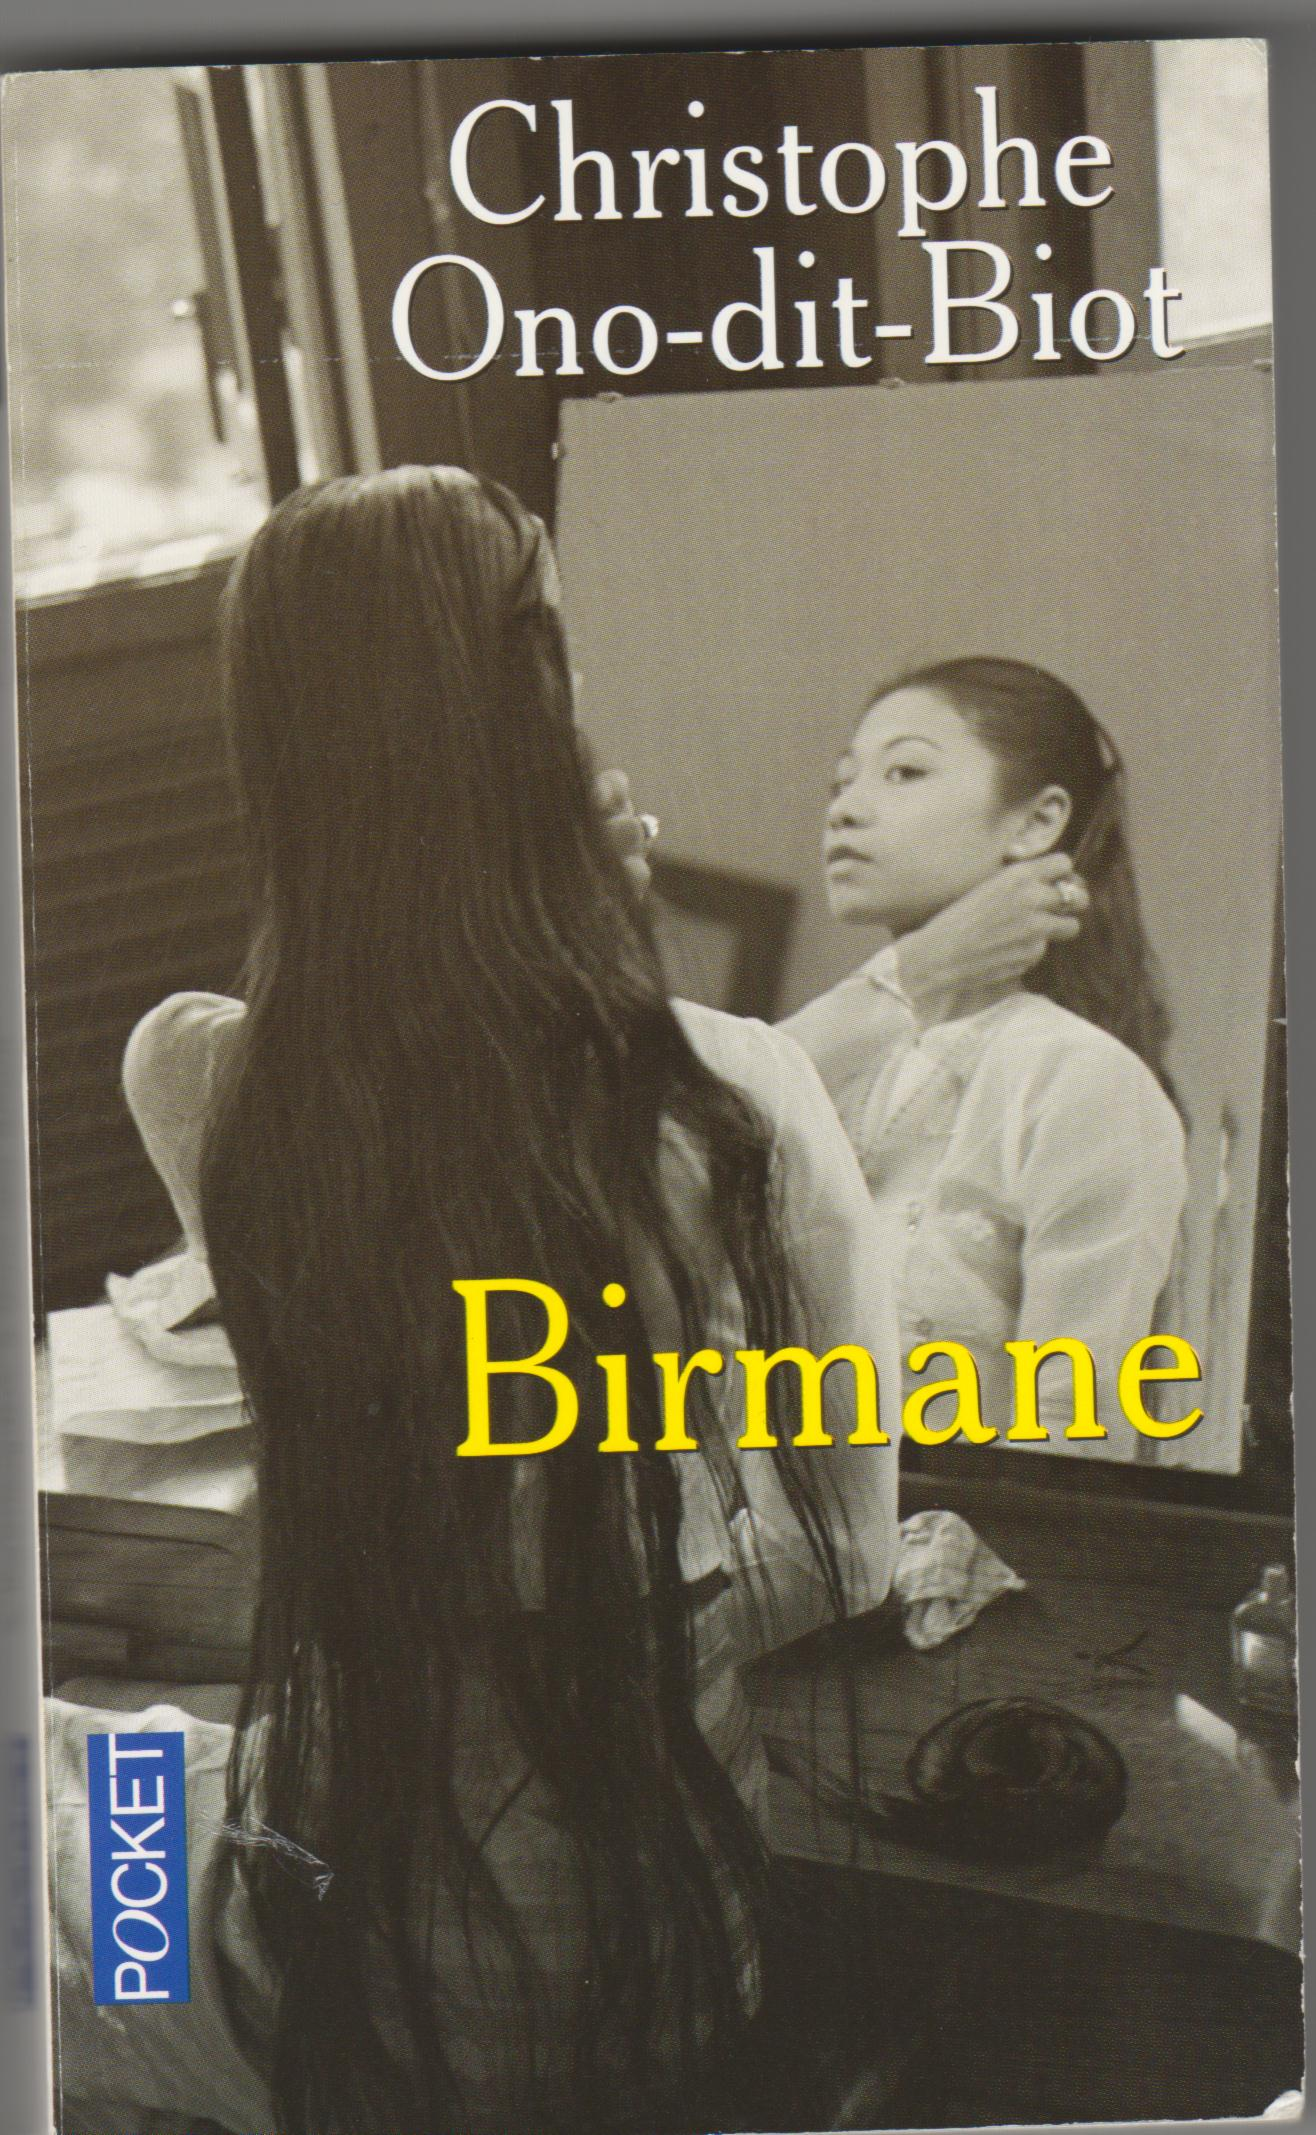 birmane001.jpg